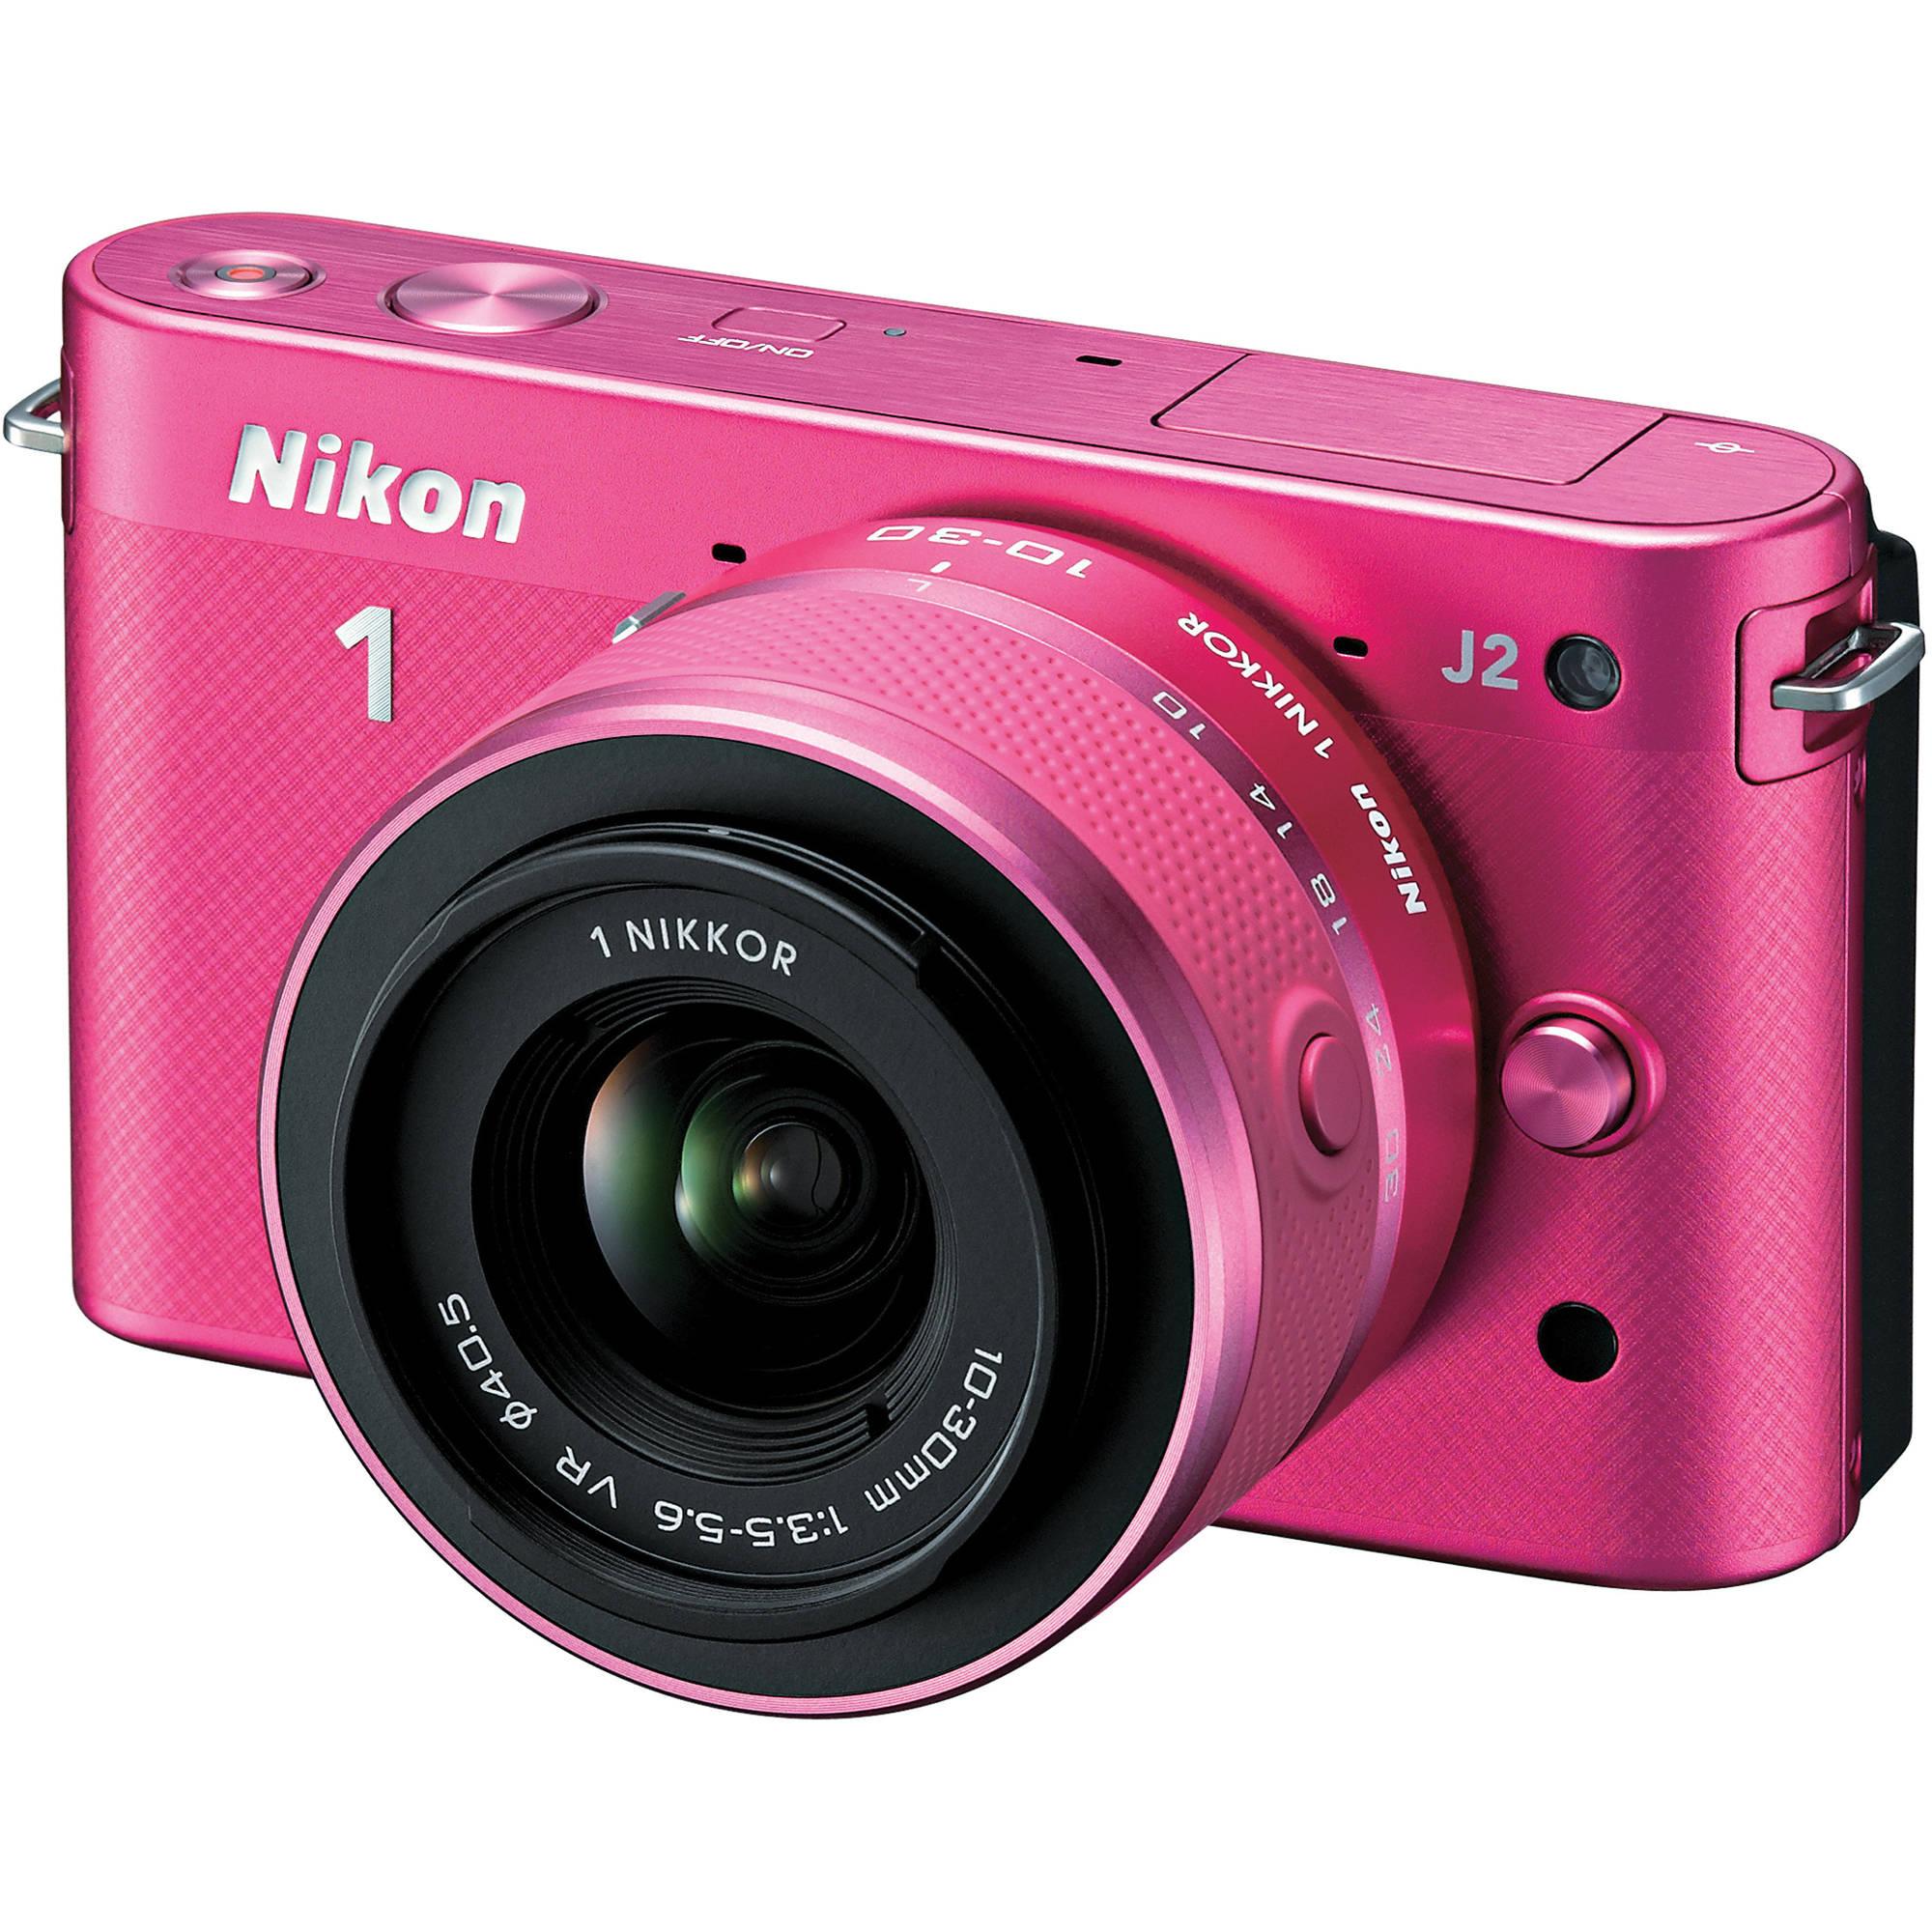 Nikon 1 J2 Mirrorless Digital Camera with 10-30mm VR Zoom